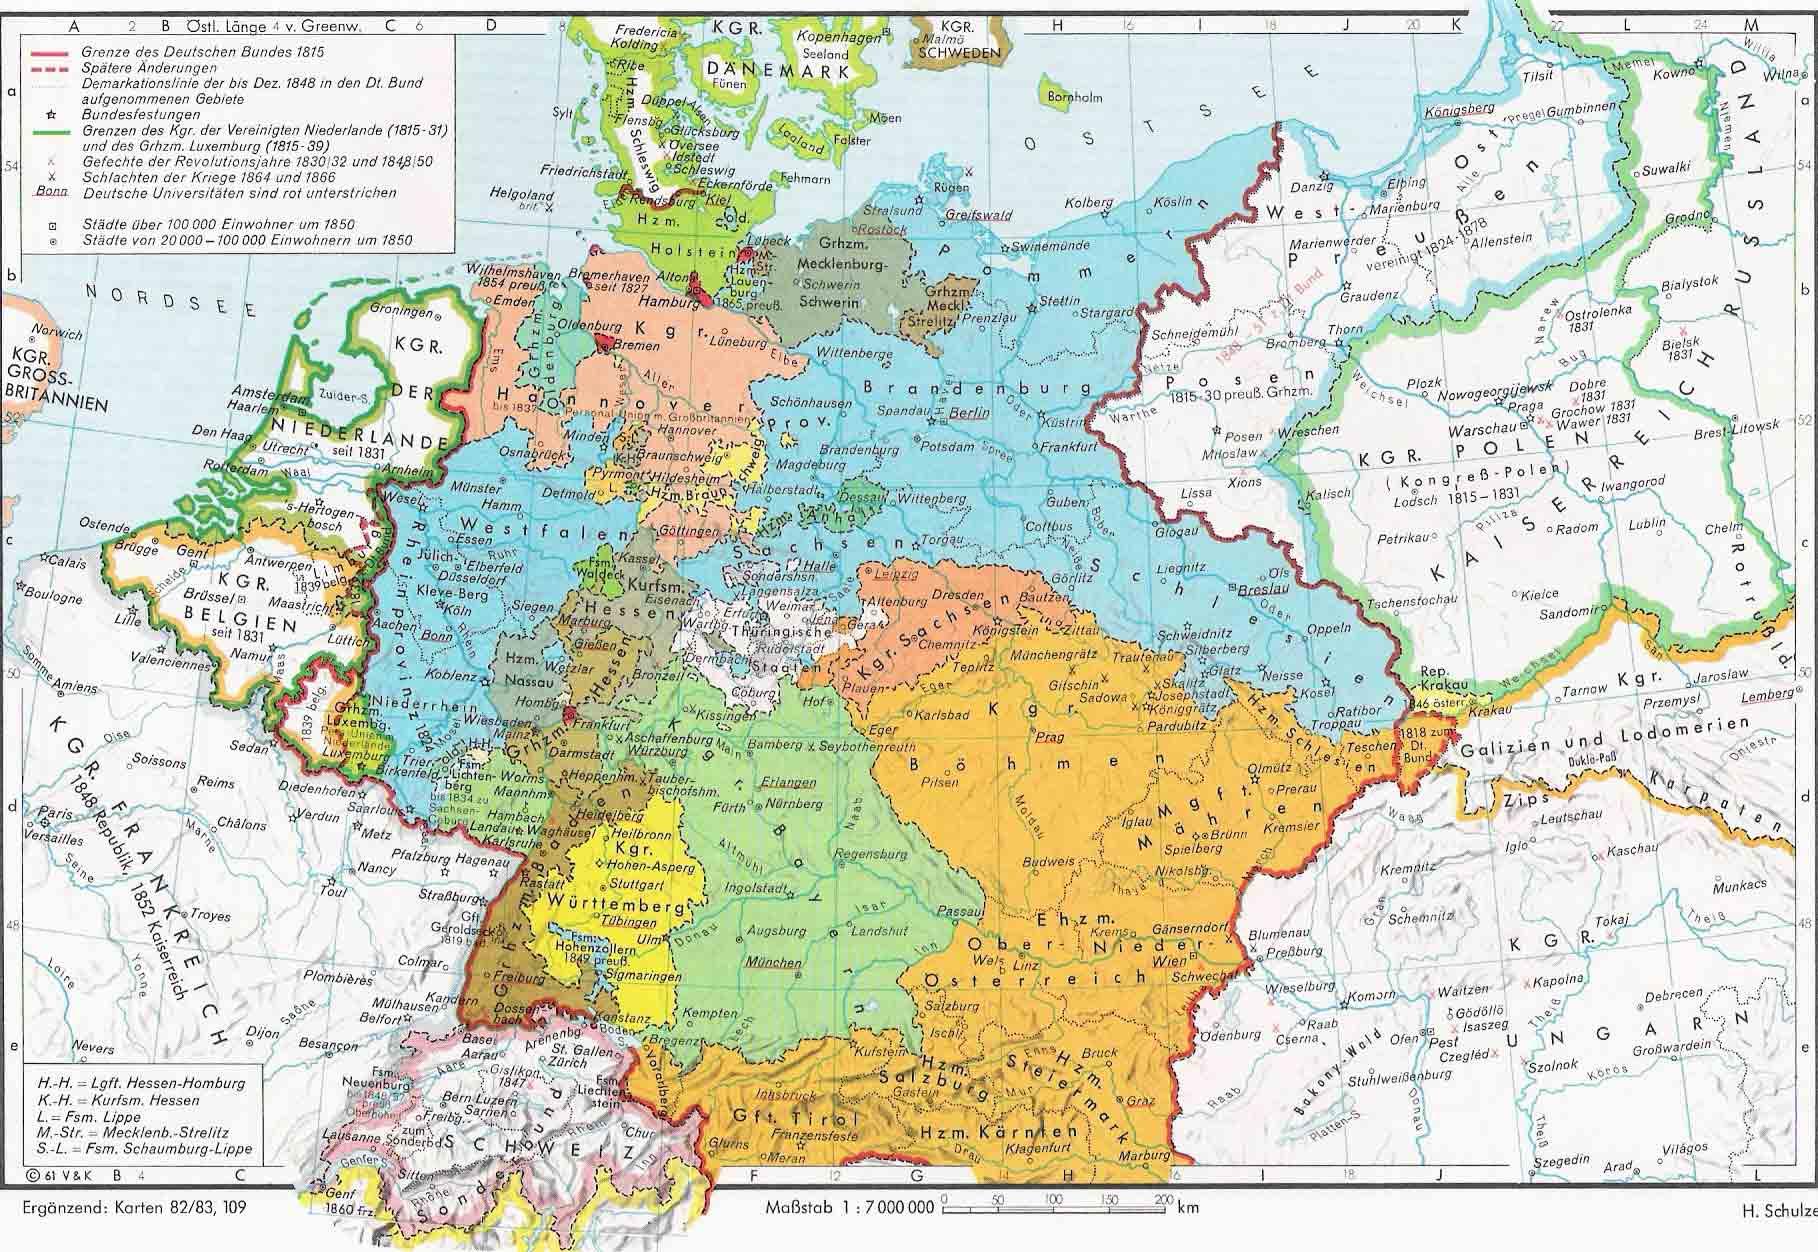 Europa 1815-1866